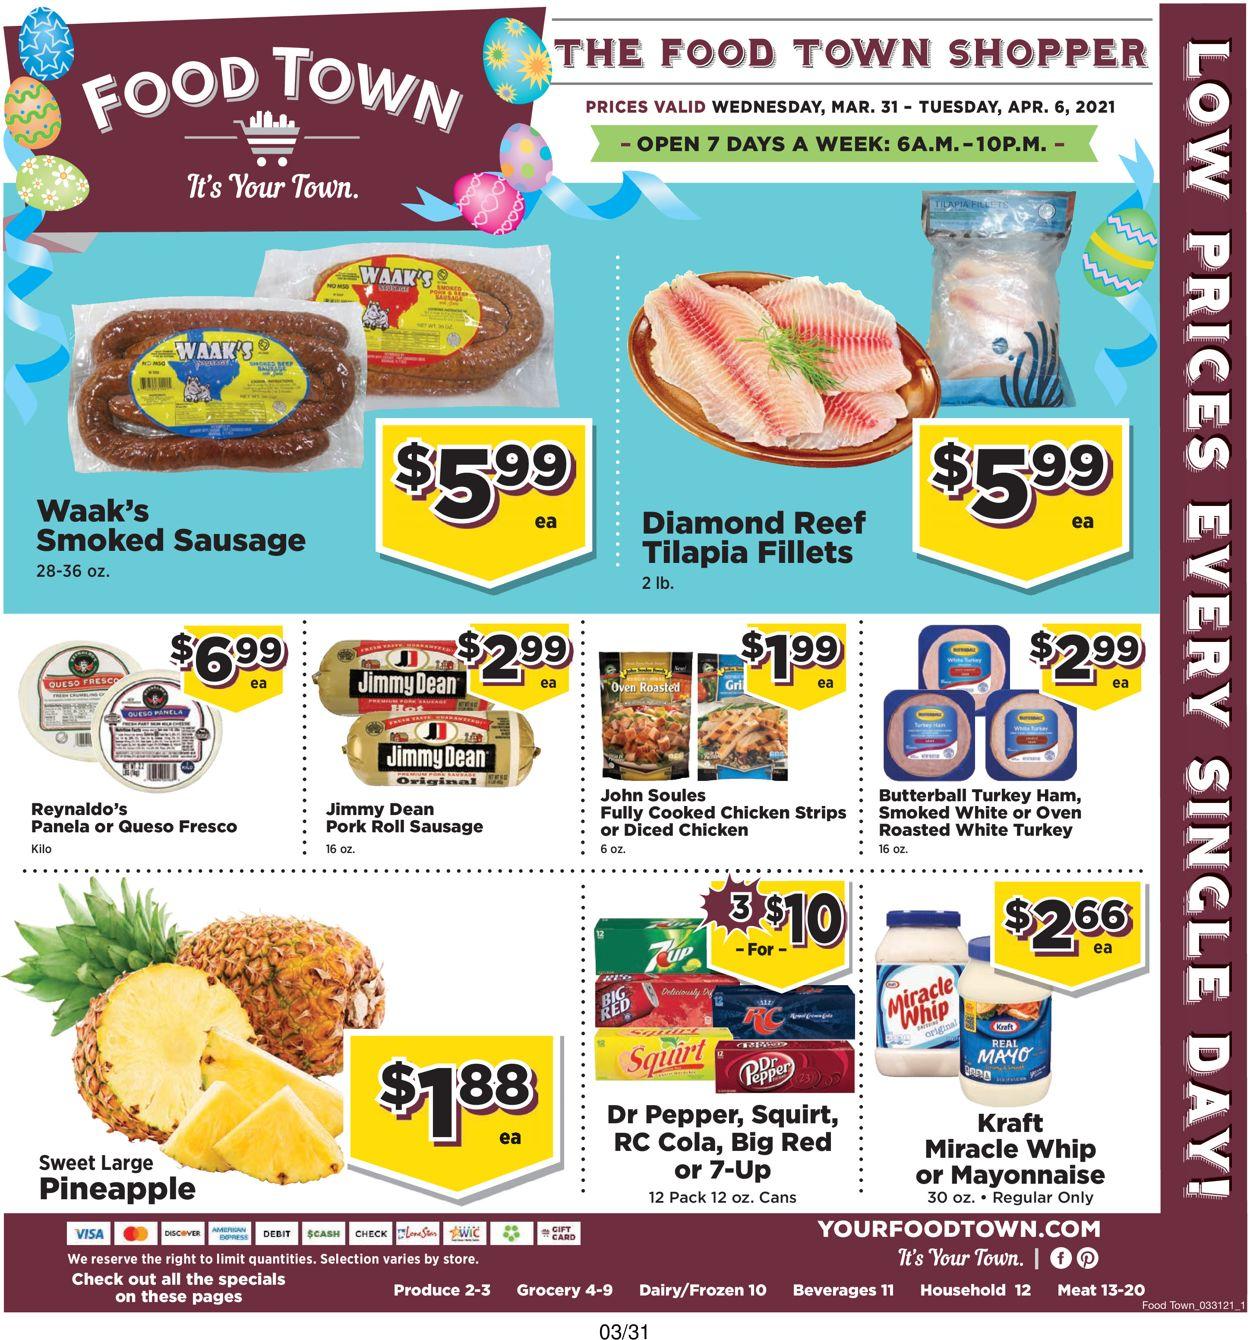 Food Town Easter 2021 Weekly Ad Circular - valid 03/31-04/06/2021